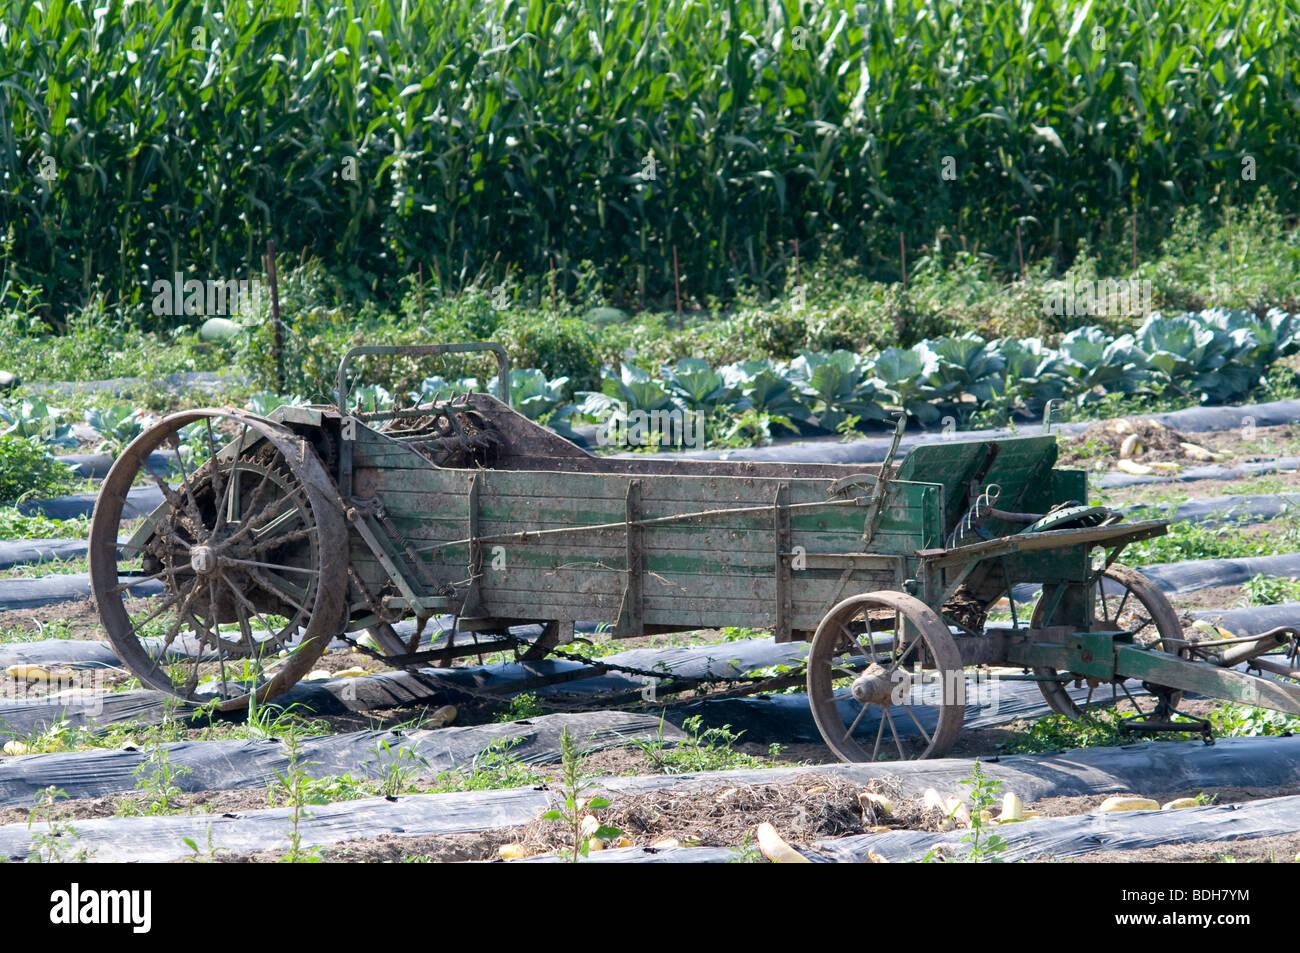 Manure spreader on Amish farm in Ohio - Stock Image